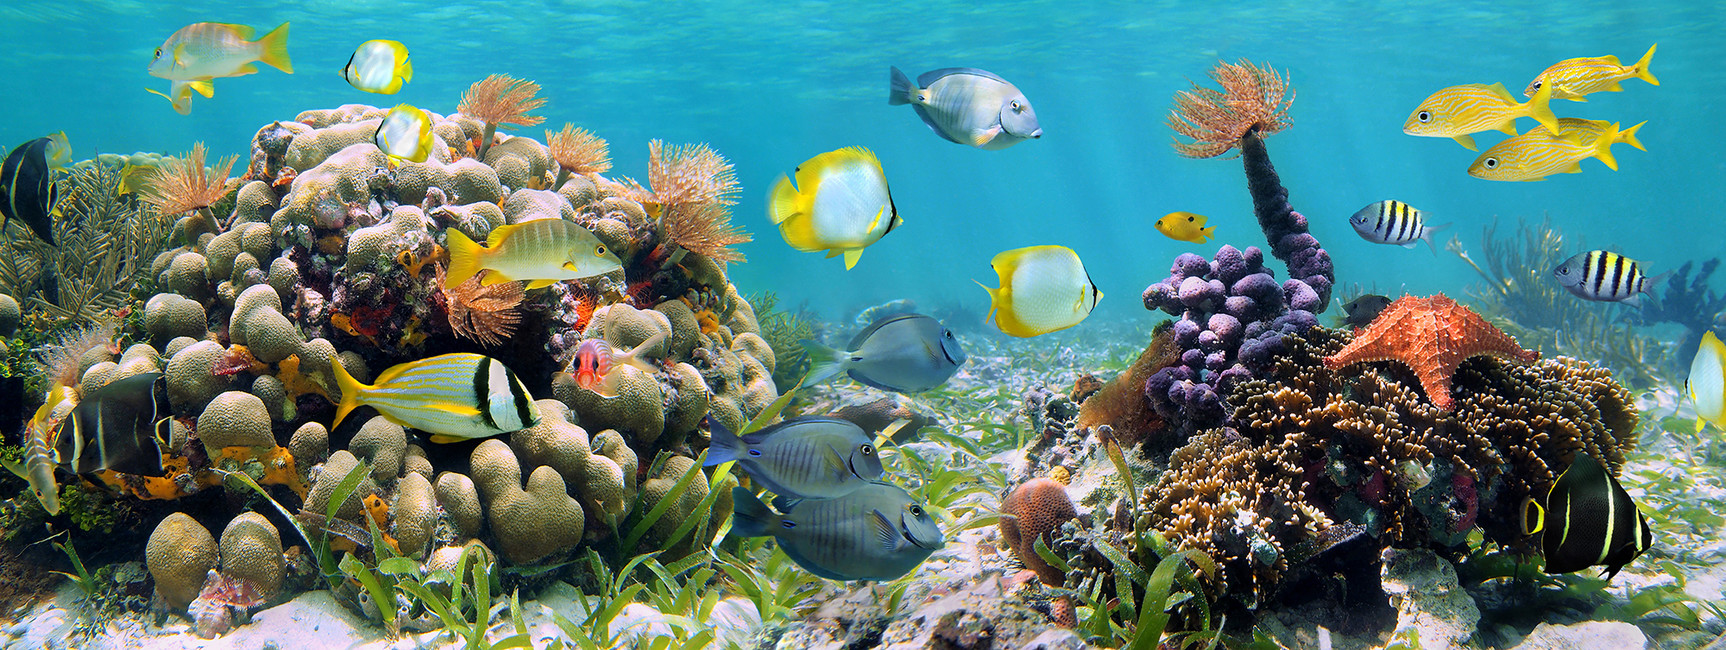 Panorama Coral Reef   Wall Mural Photo Wallpaper   Photowall 1726x650